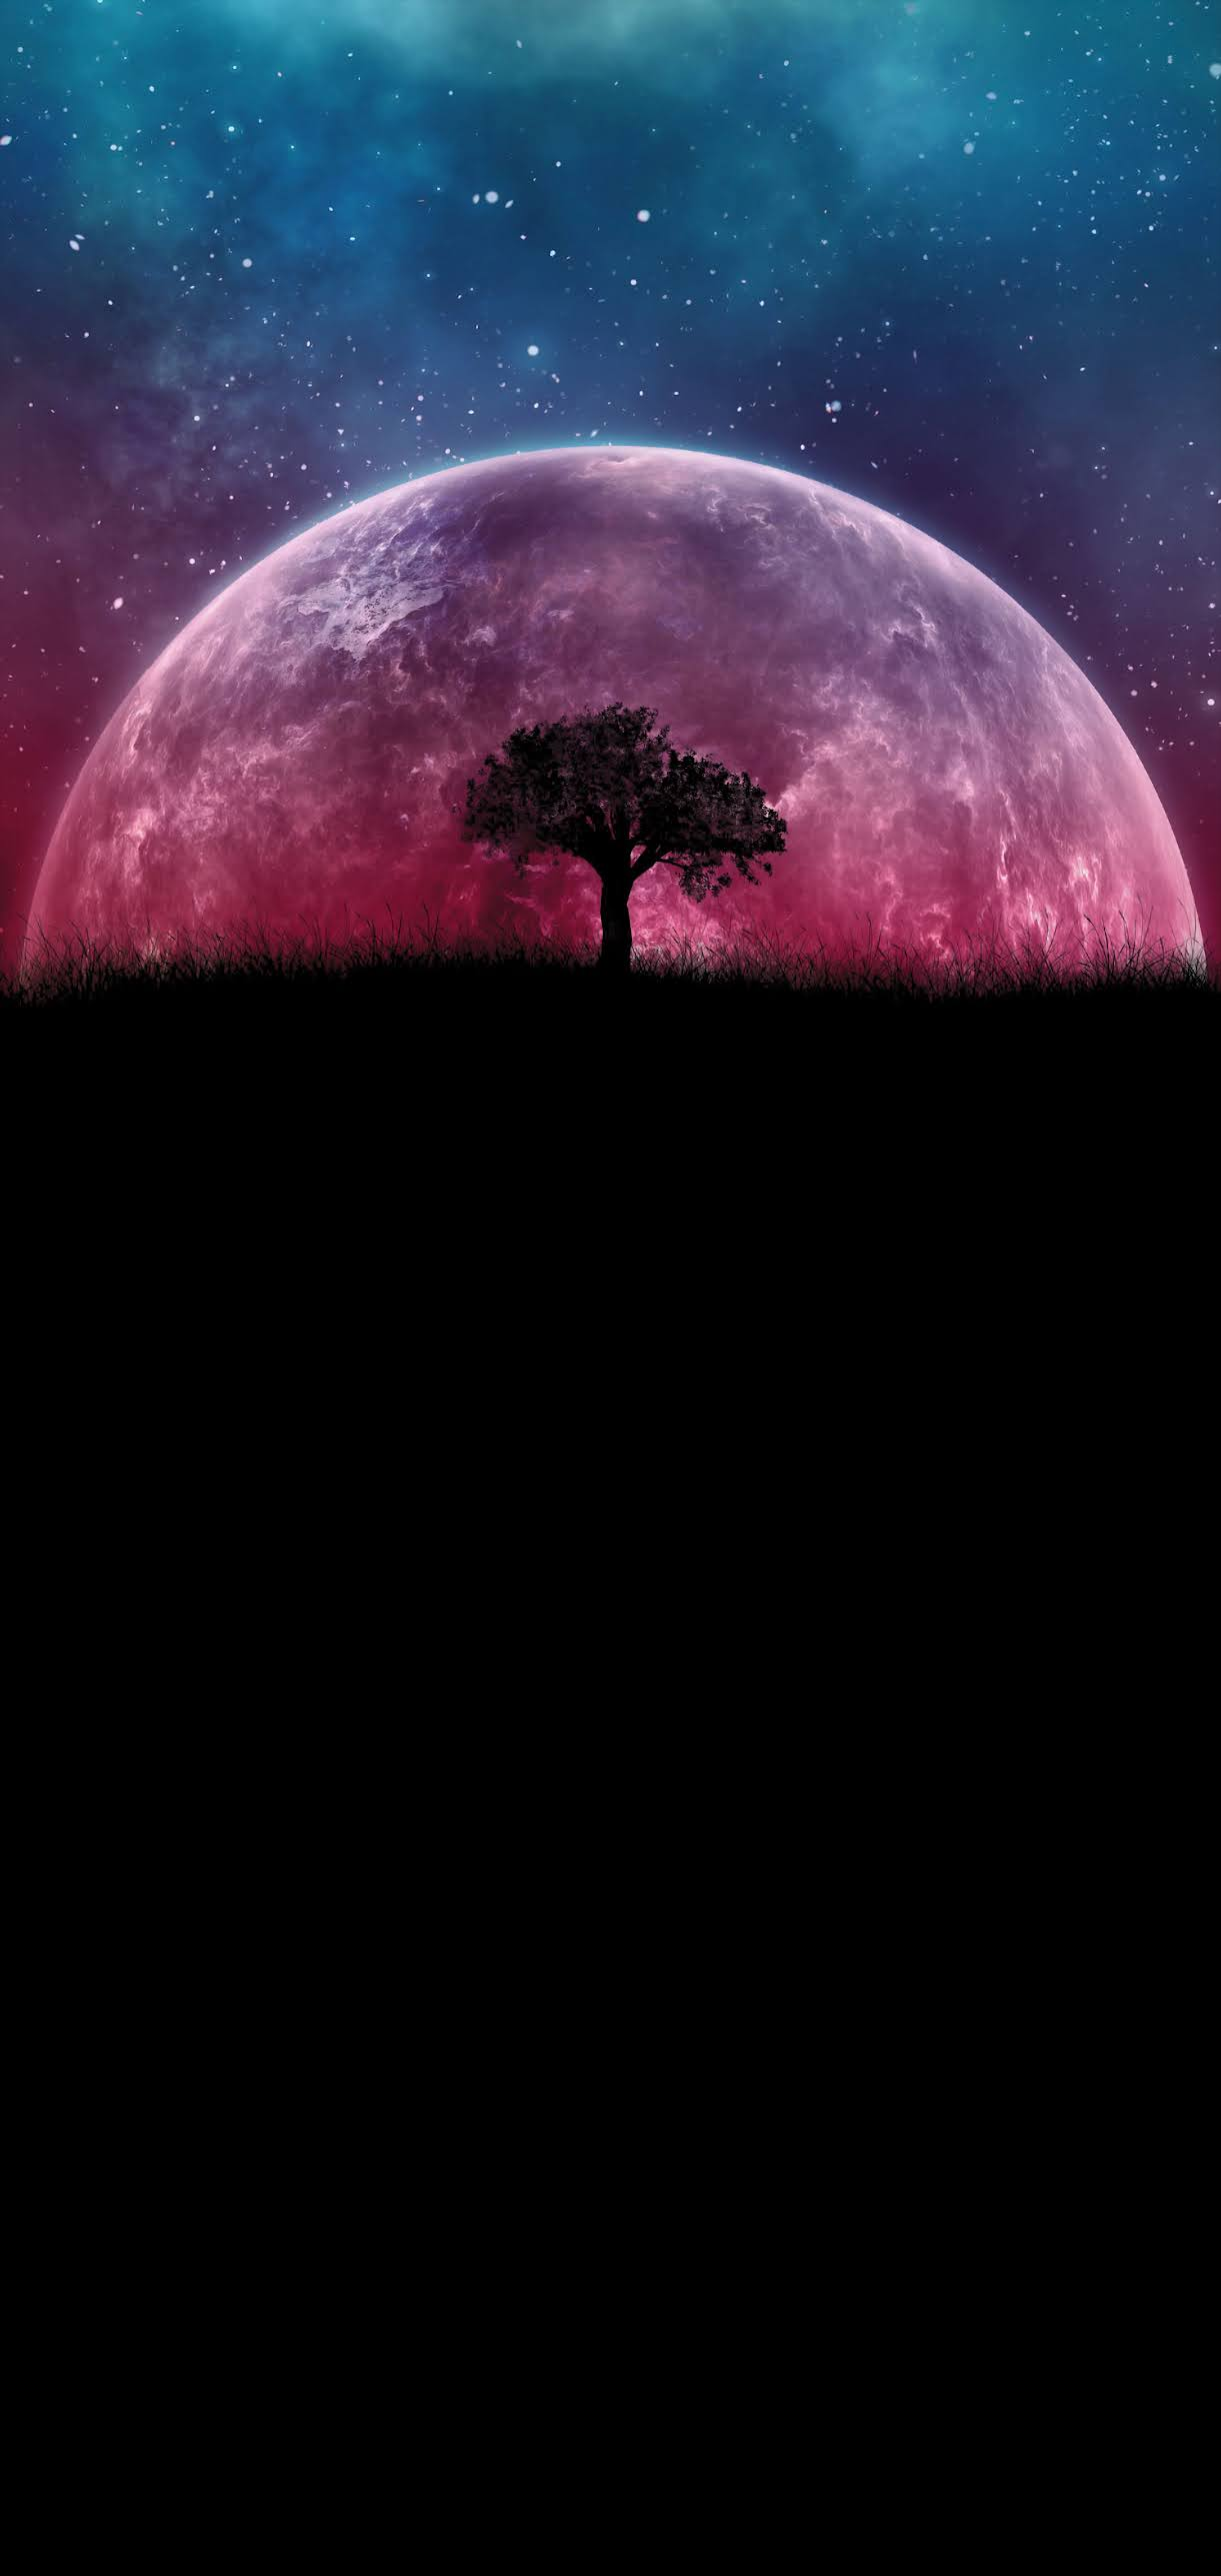 TREE SPACE PLANET FANTASY HALF AMOLED